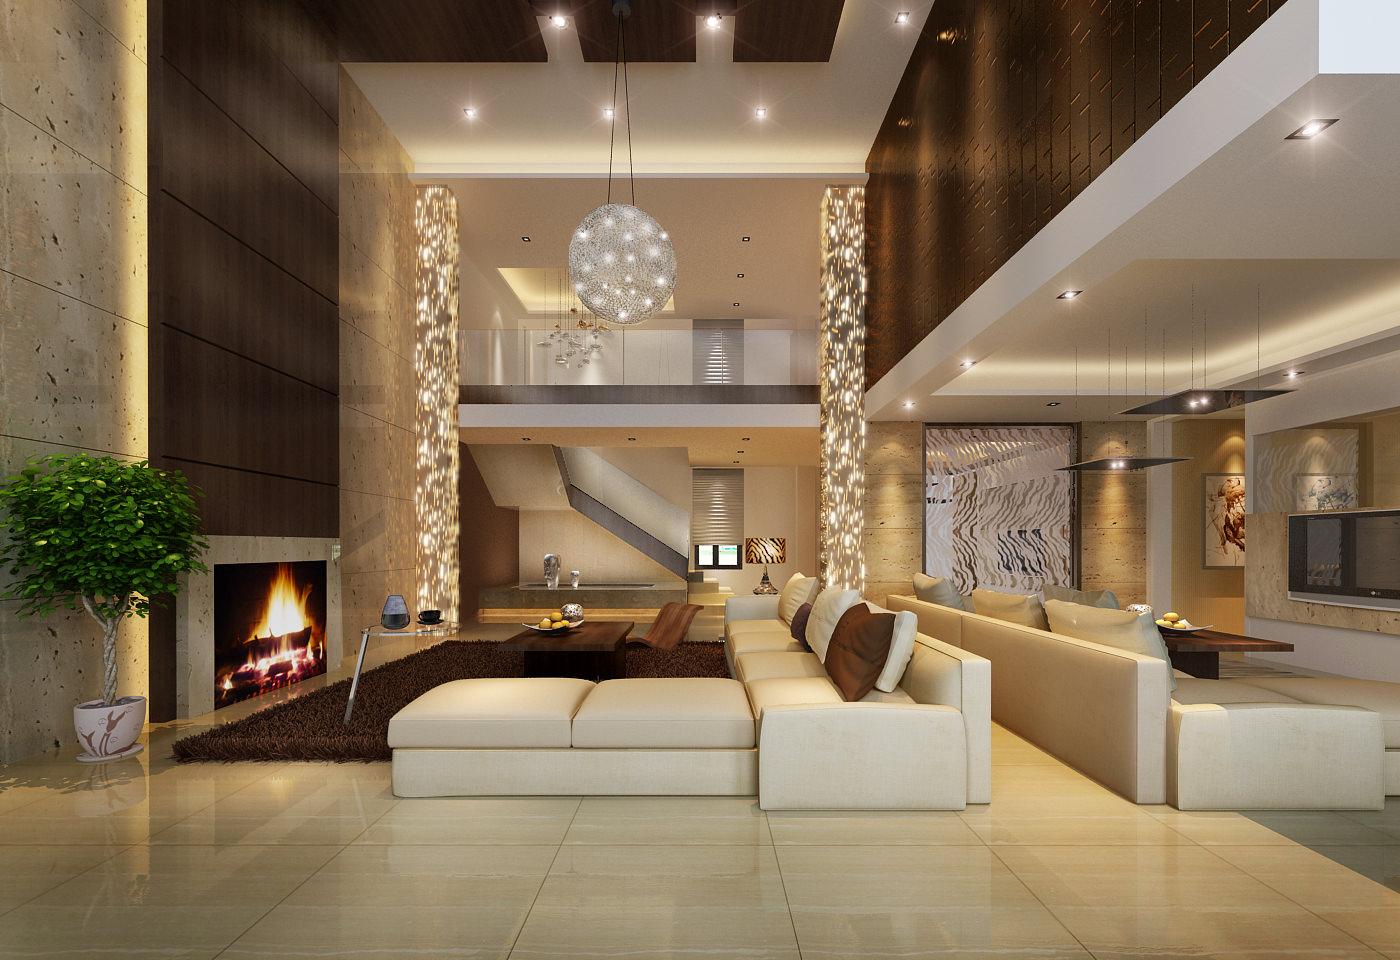 model living room. Living Room Models  Interior Design Stunning Model Of Photos Best idea home design